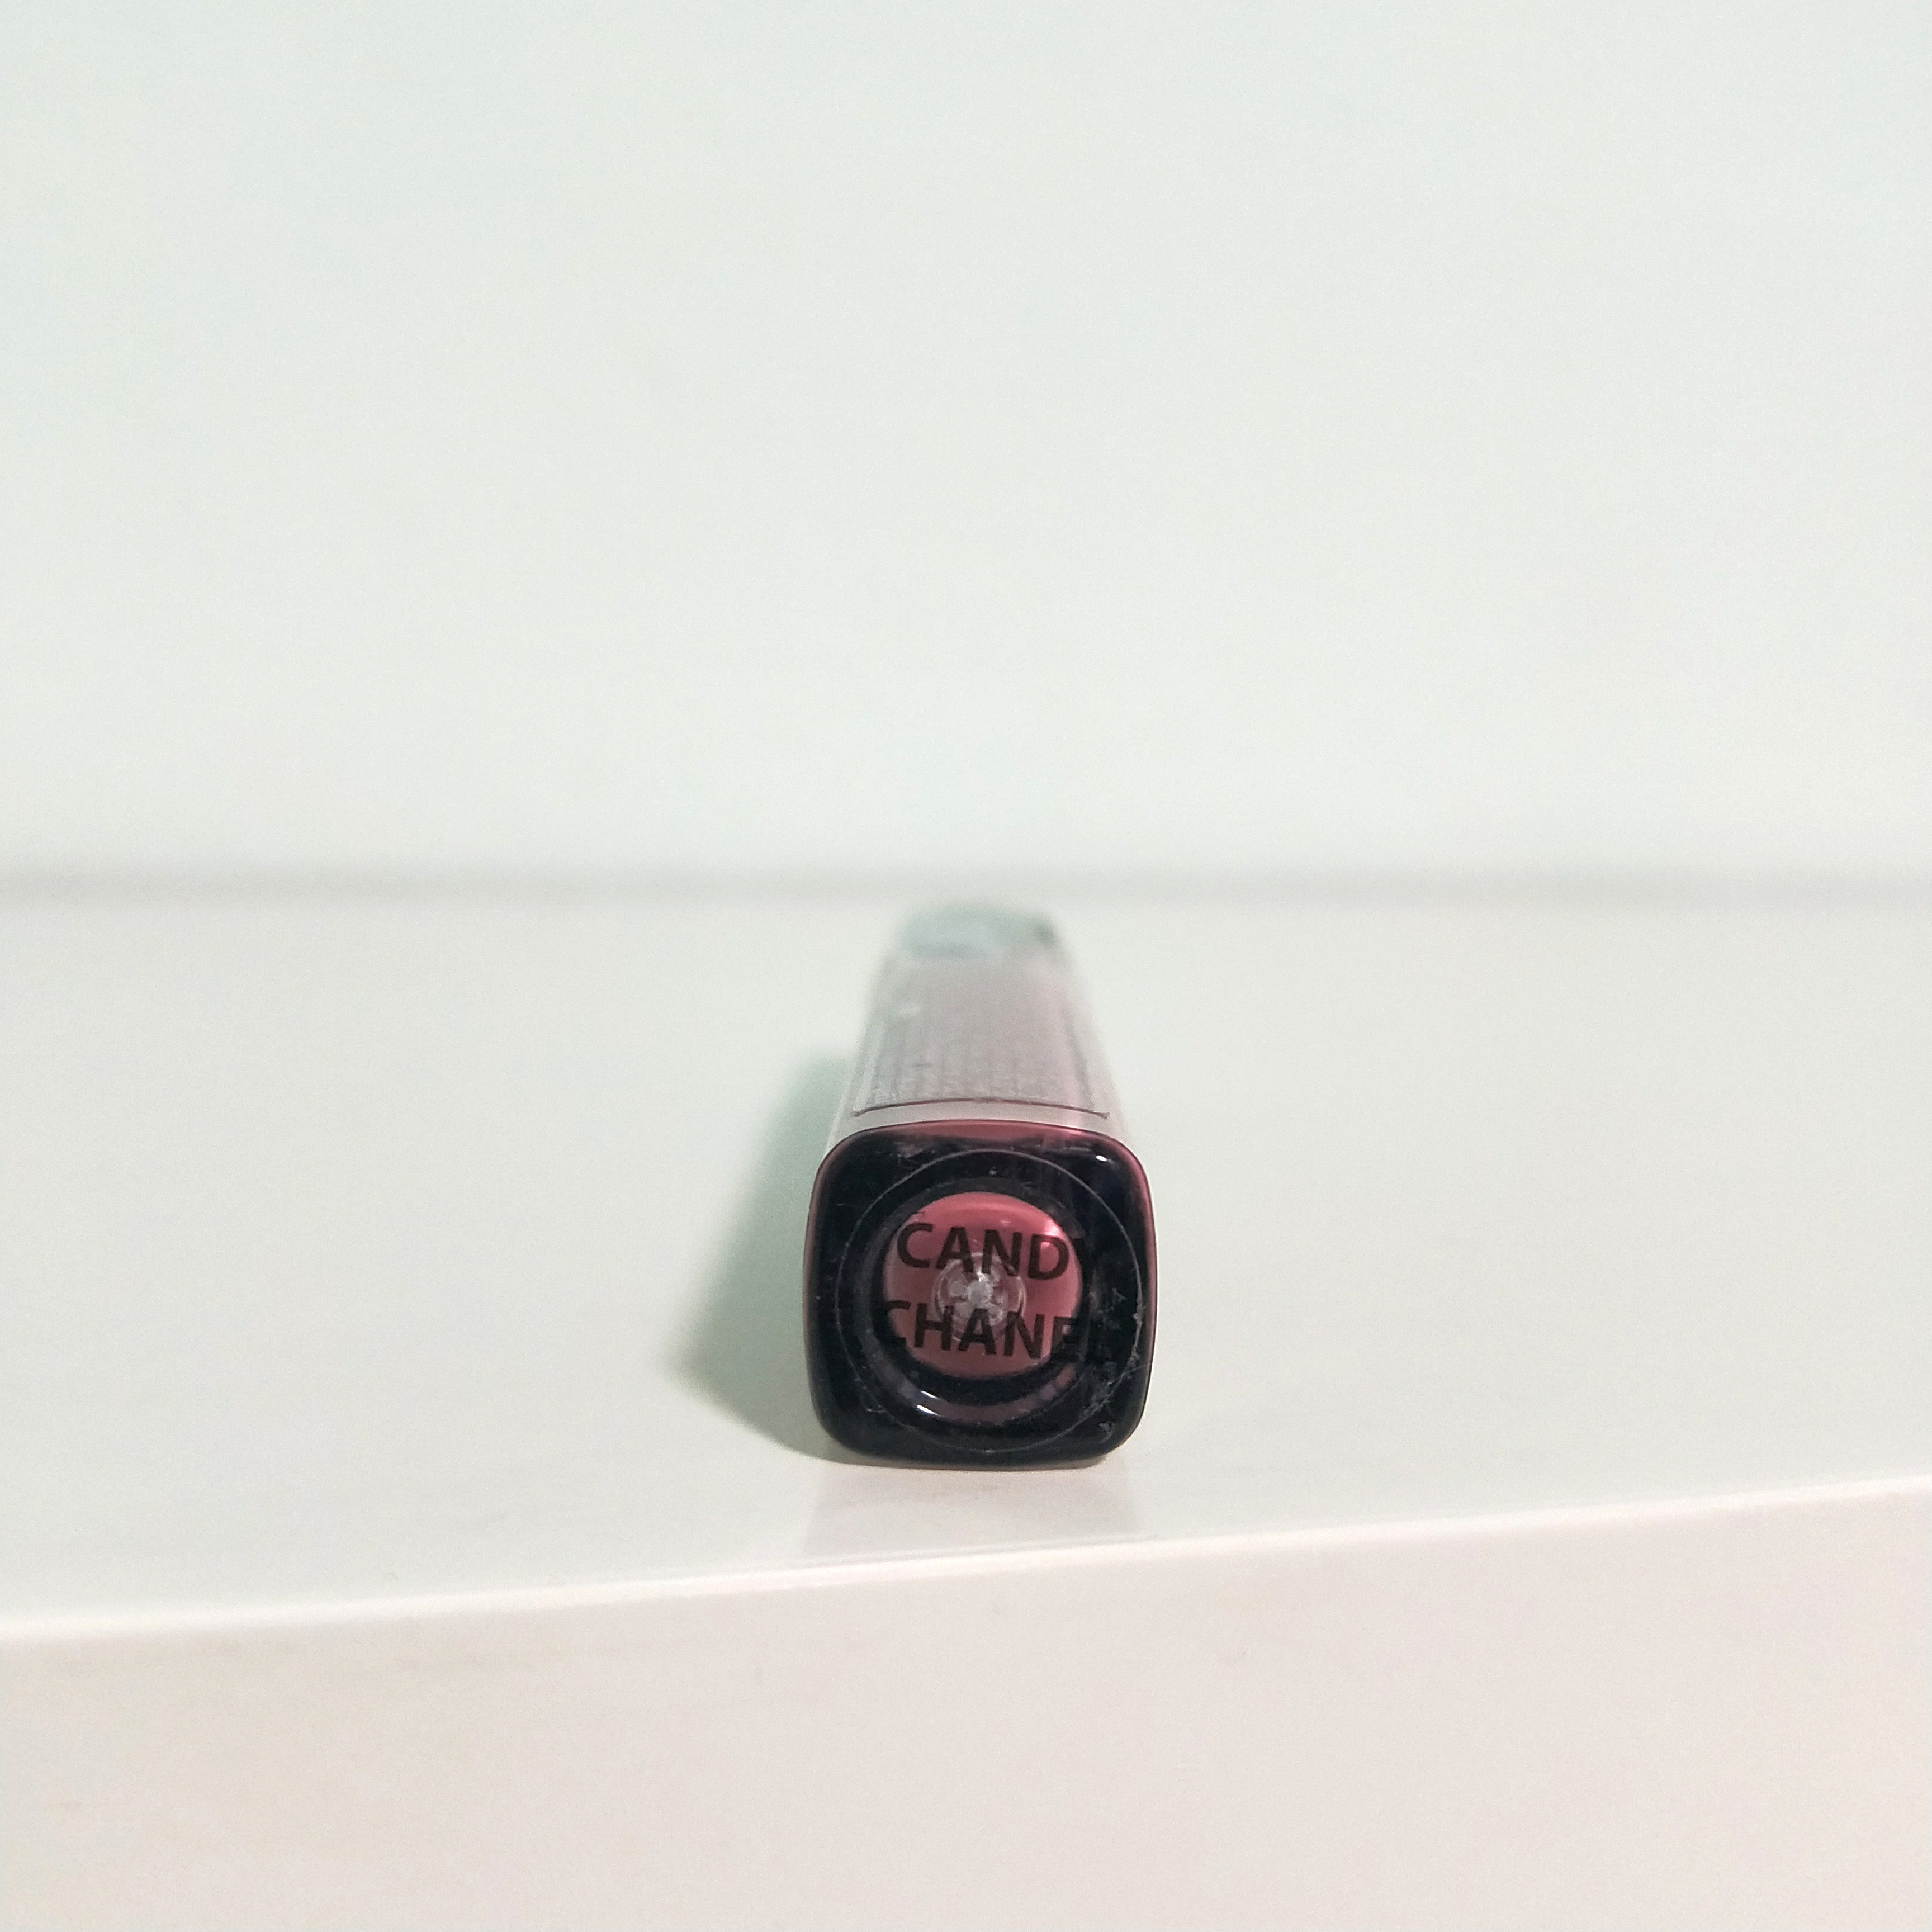 Klara Cosmetics Mini Kissproof Lips Candy Chanel Health Beauty Liquid Eyeliner 1 Black Makeup On Carousell